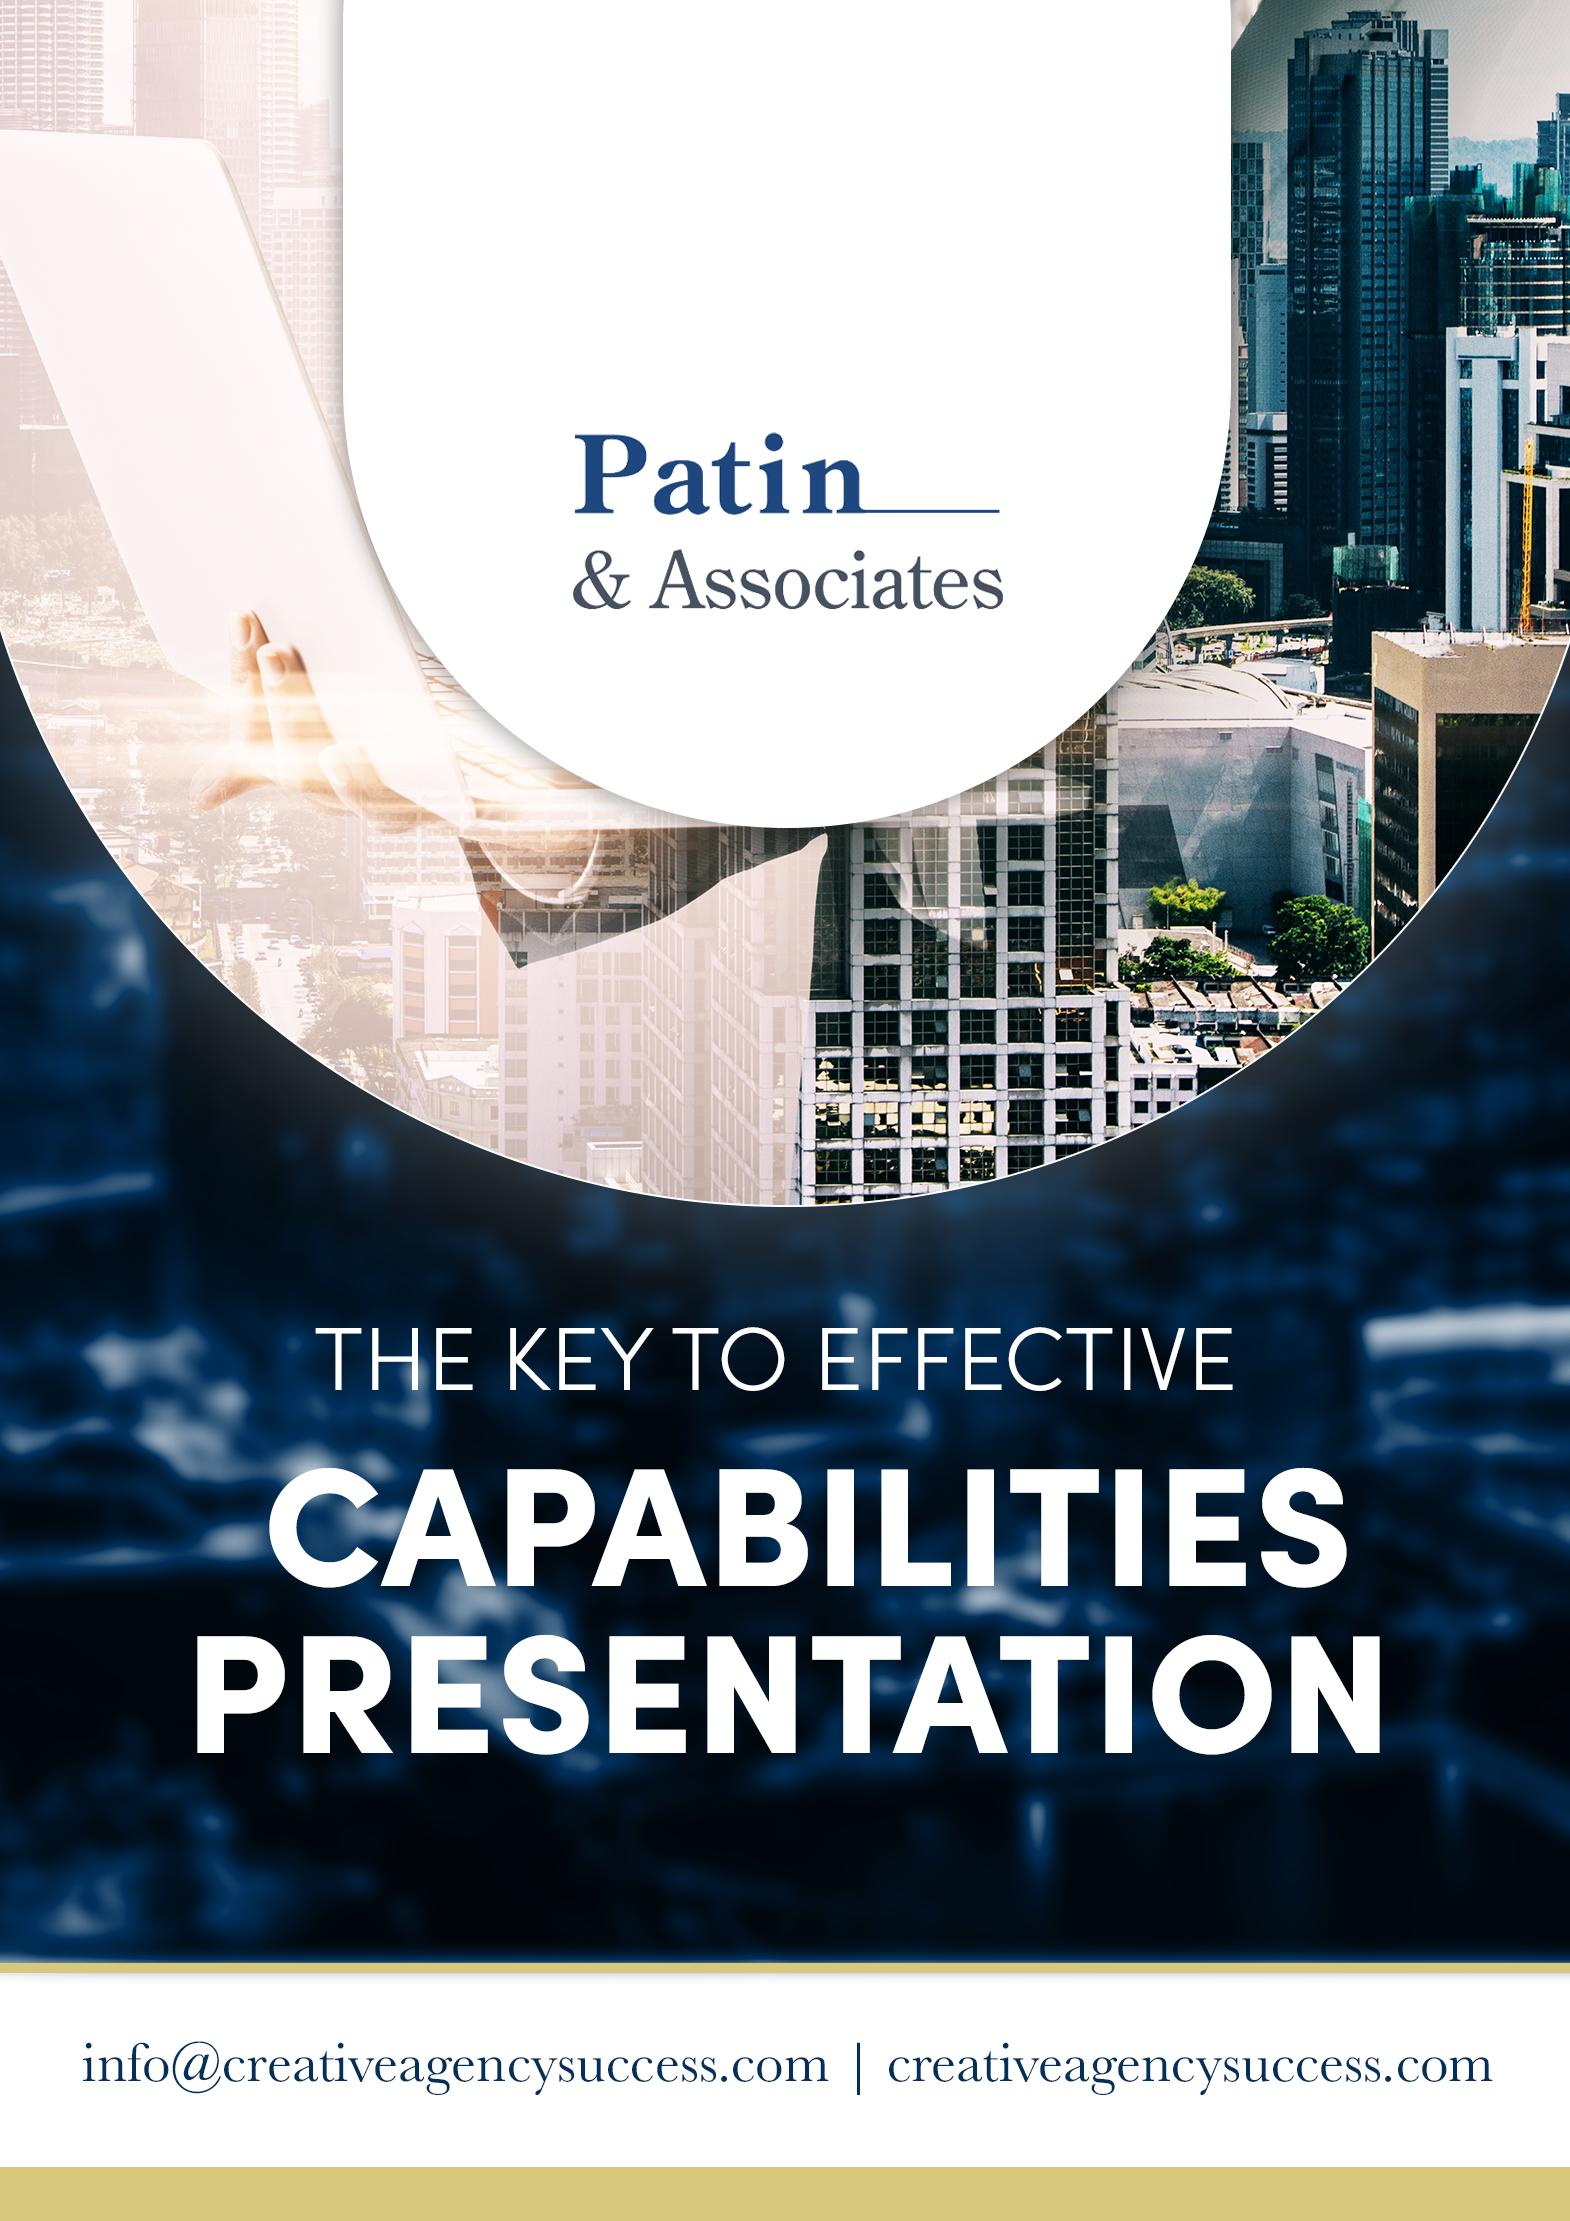 The key to effective capabilities presentation